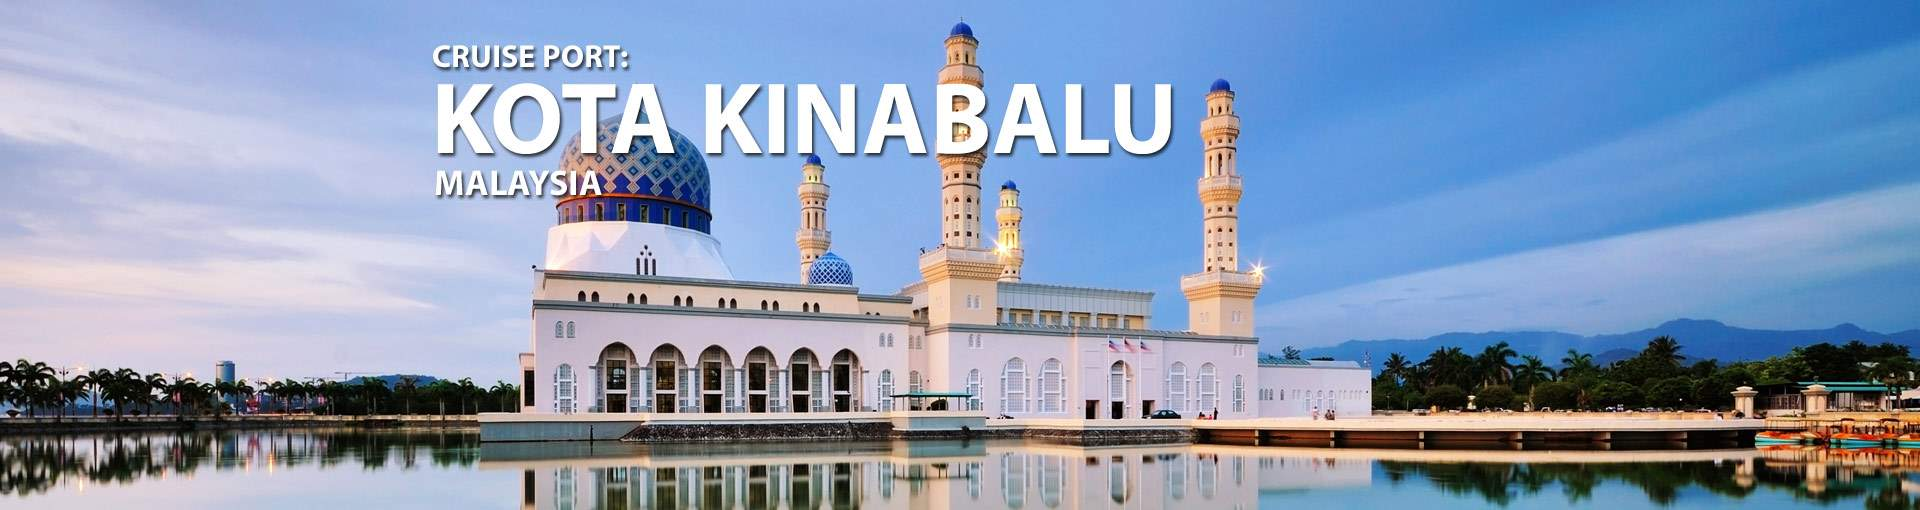 Cruises from Kota Kinabalu, Malaysia